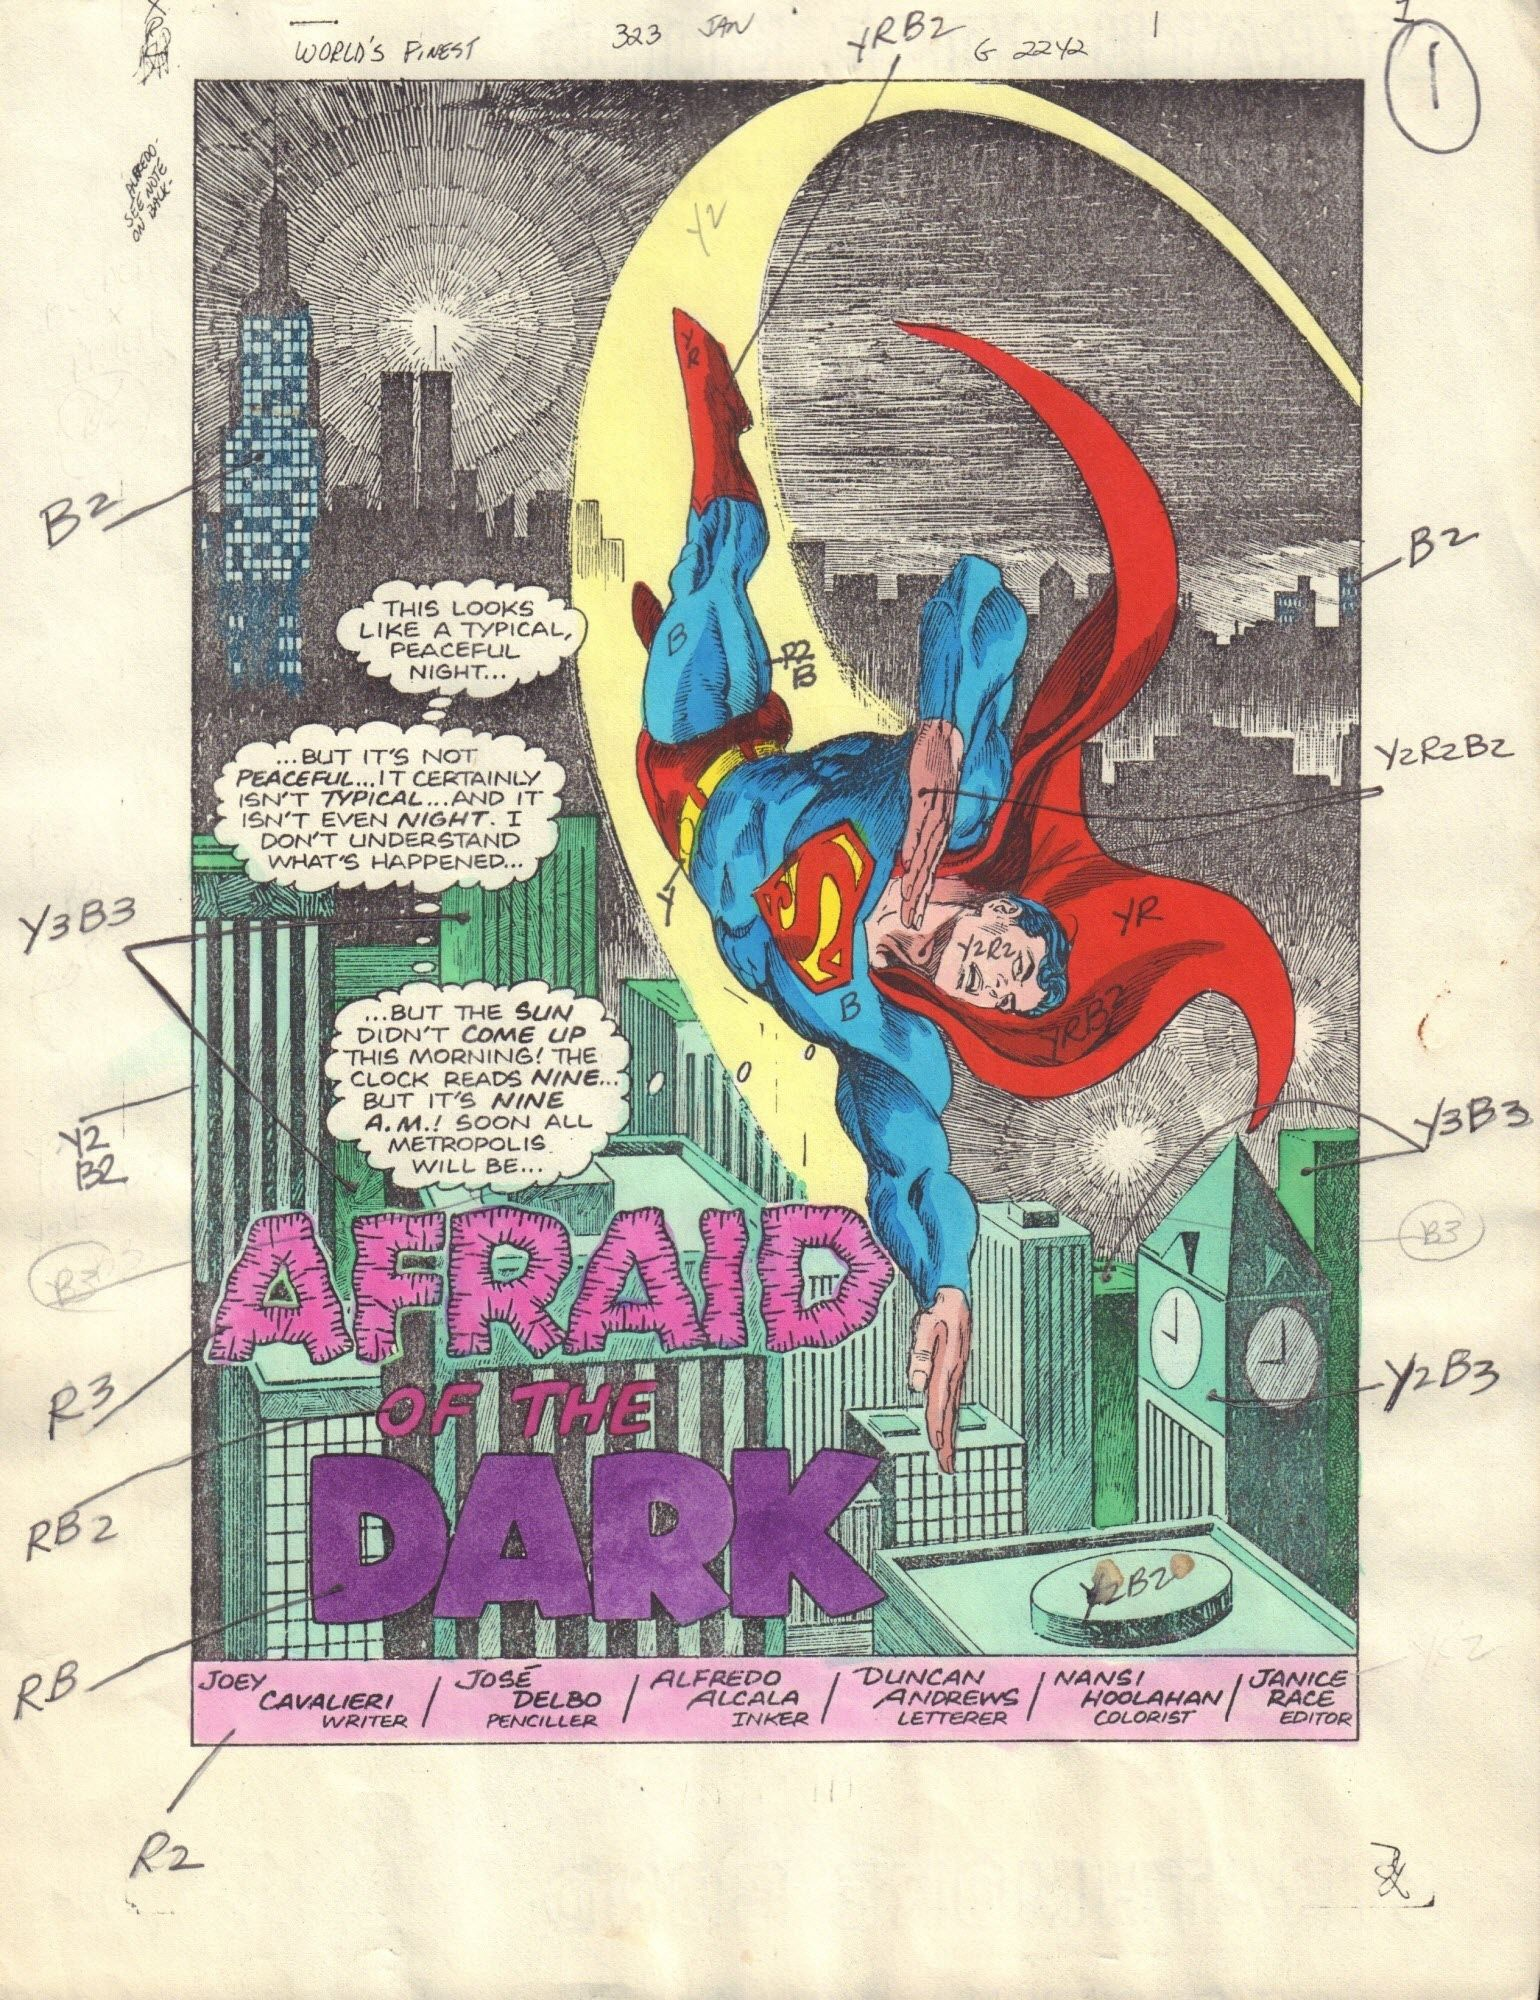 World's Finest Comics #323 / 1